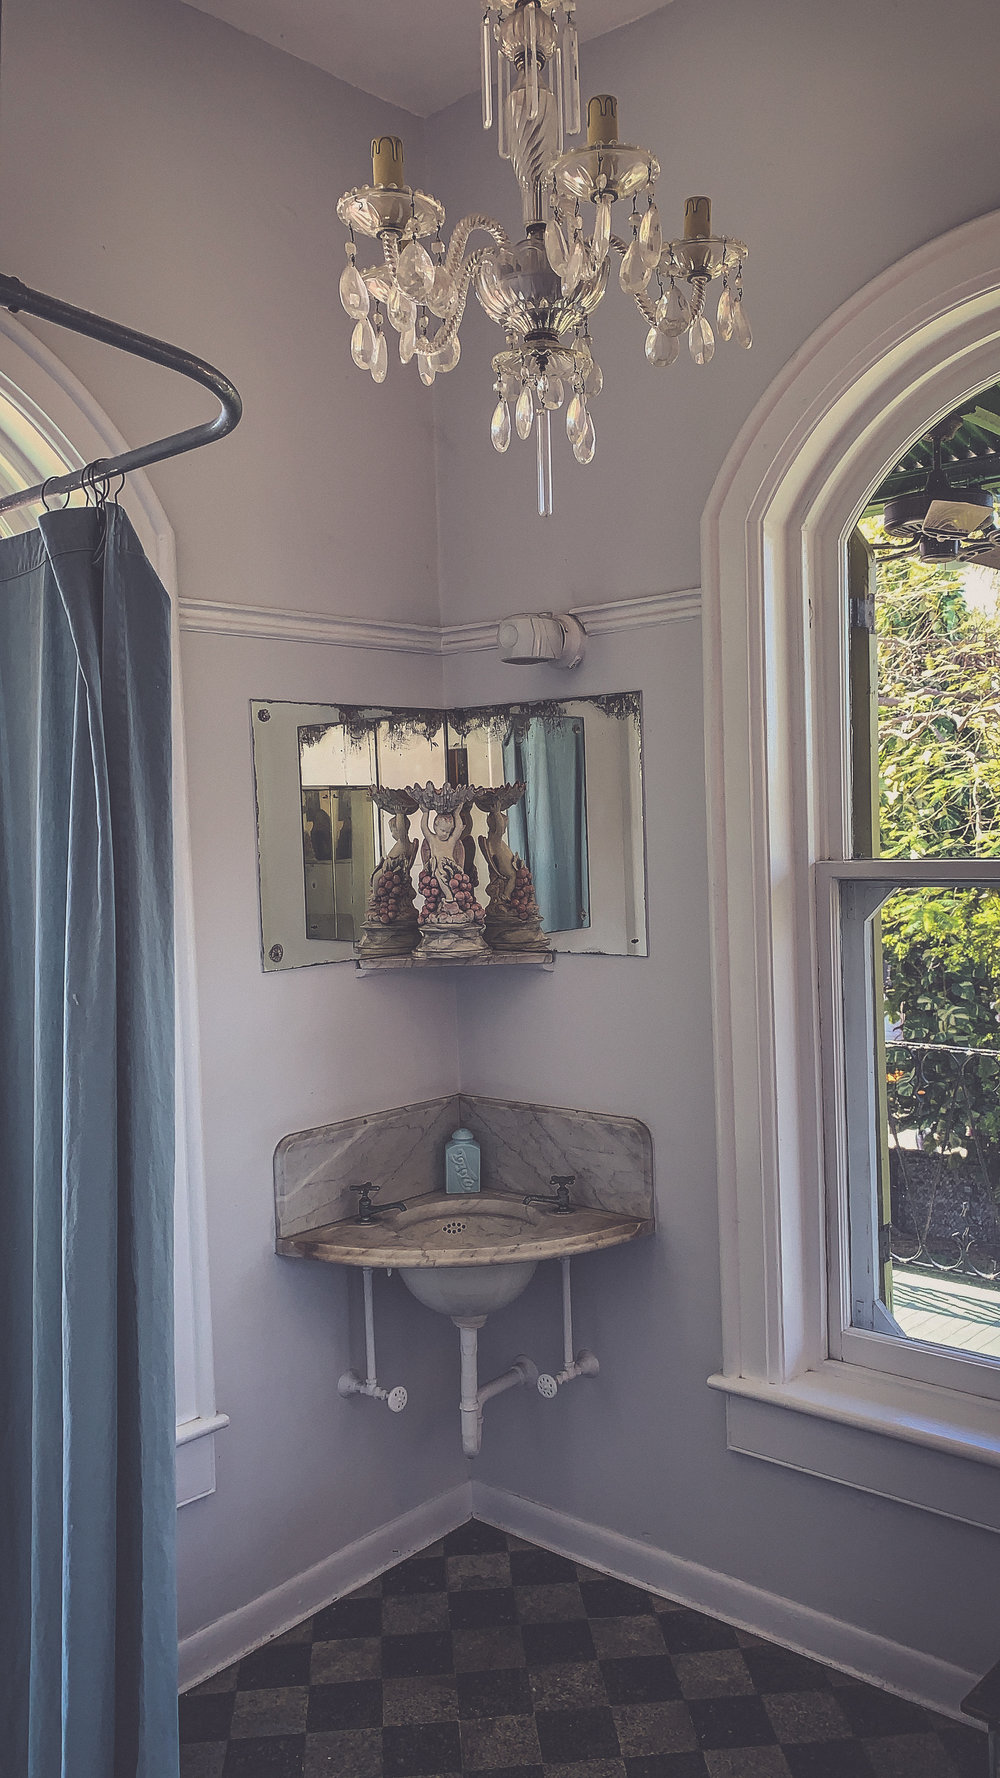 Preserved inside the Hemingway Home